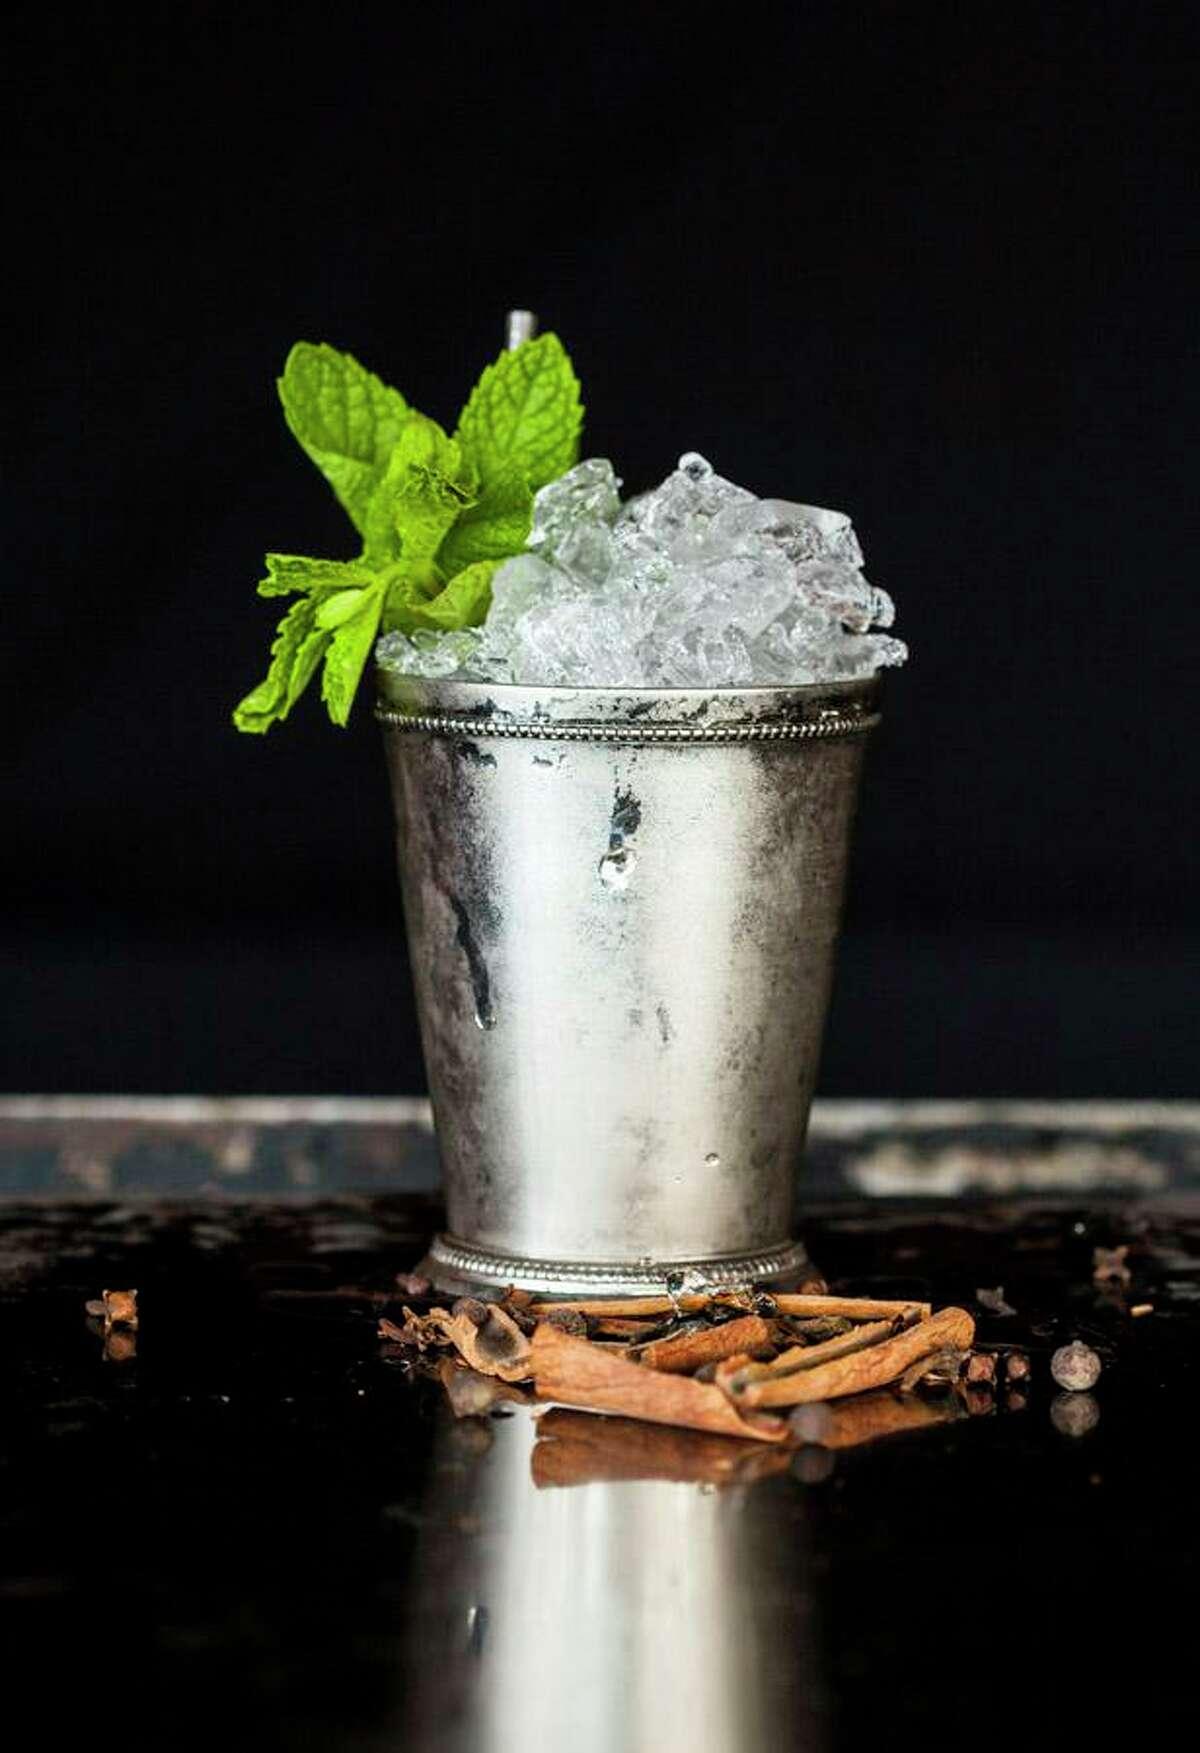 A Mint Julep at Julep, Alba Huerta's cocktail bar.